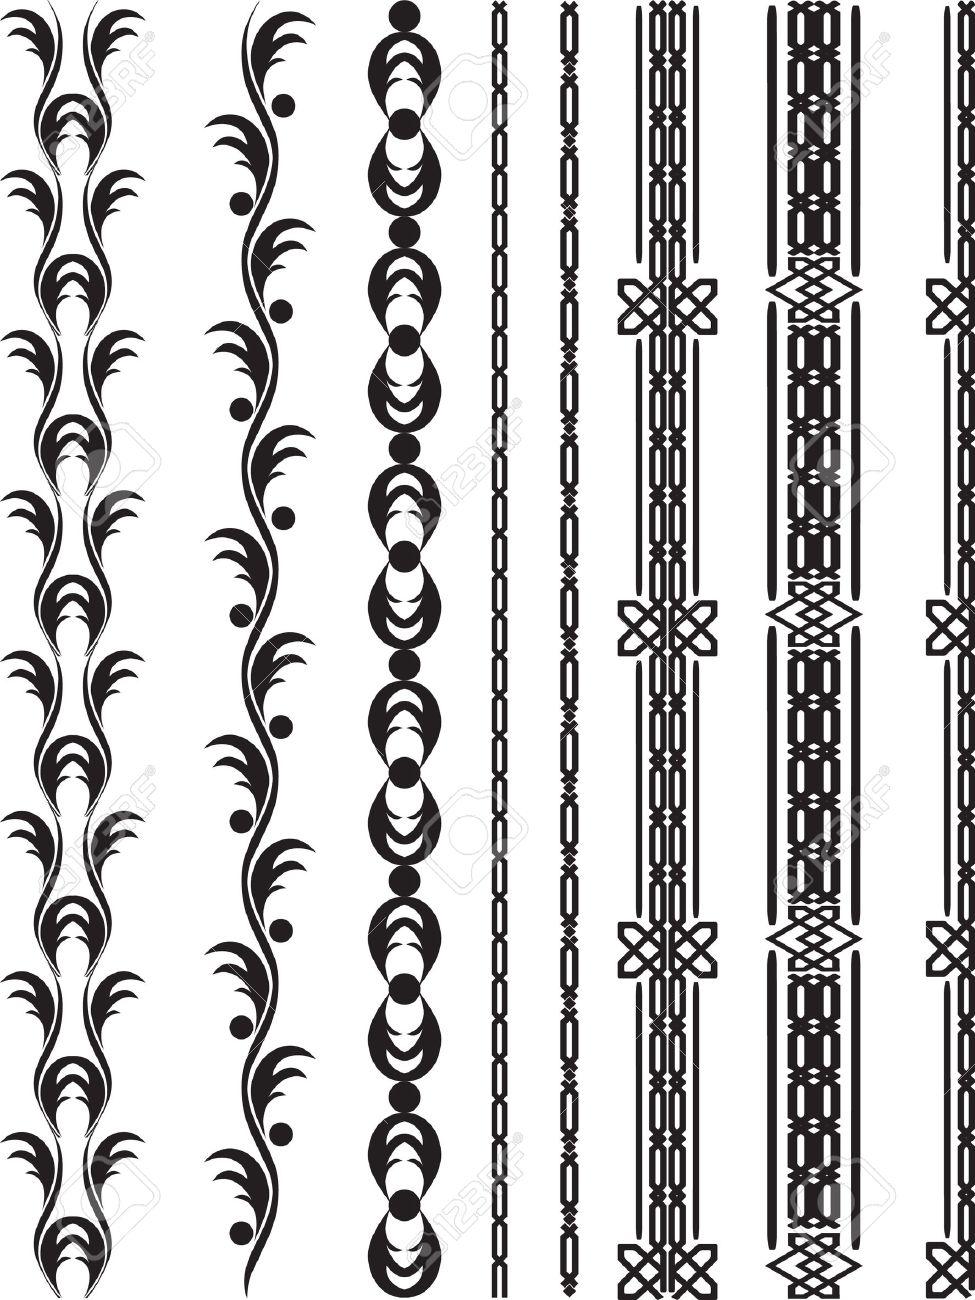 vector design elements - 10594252